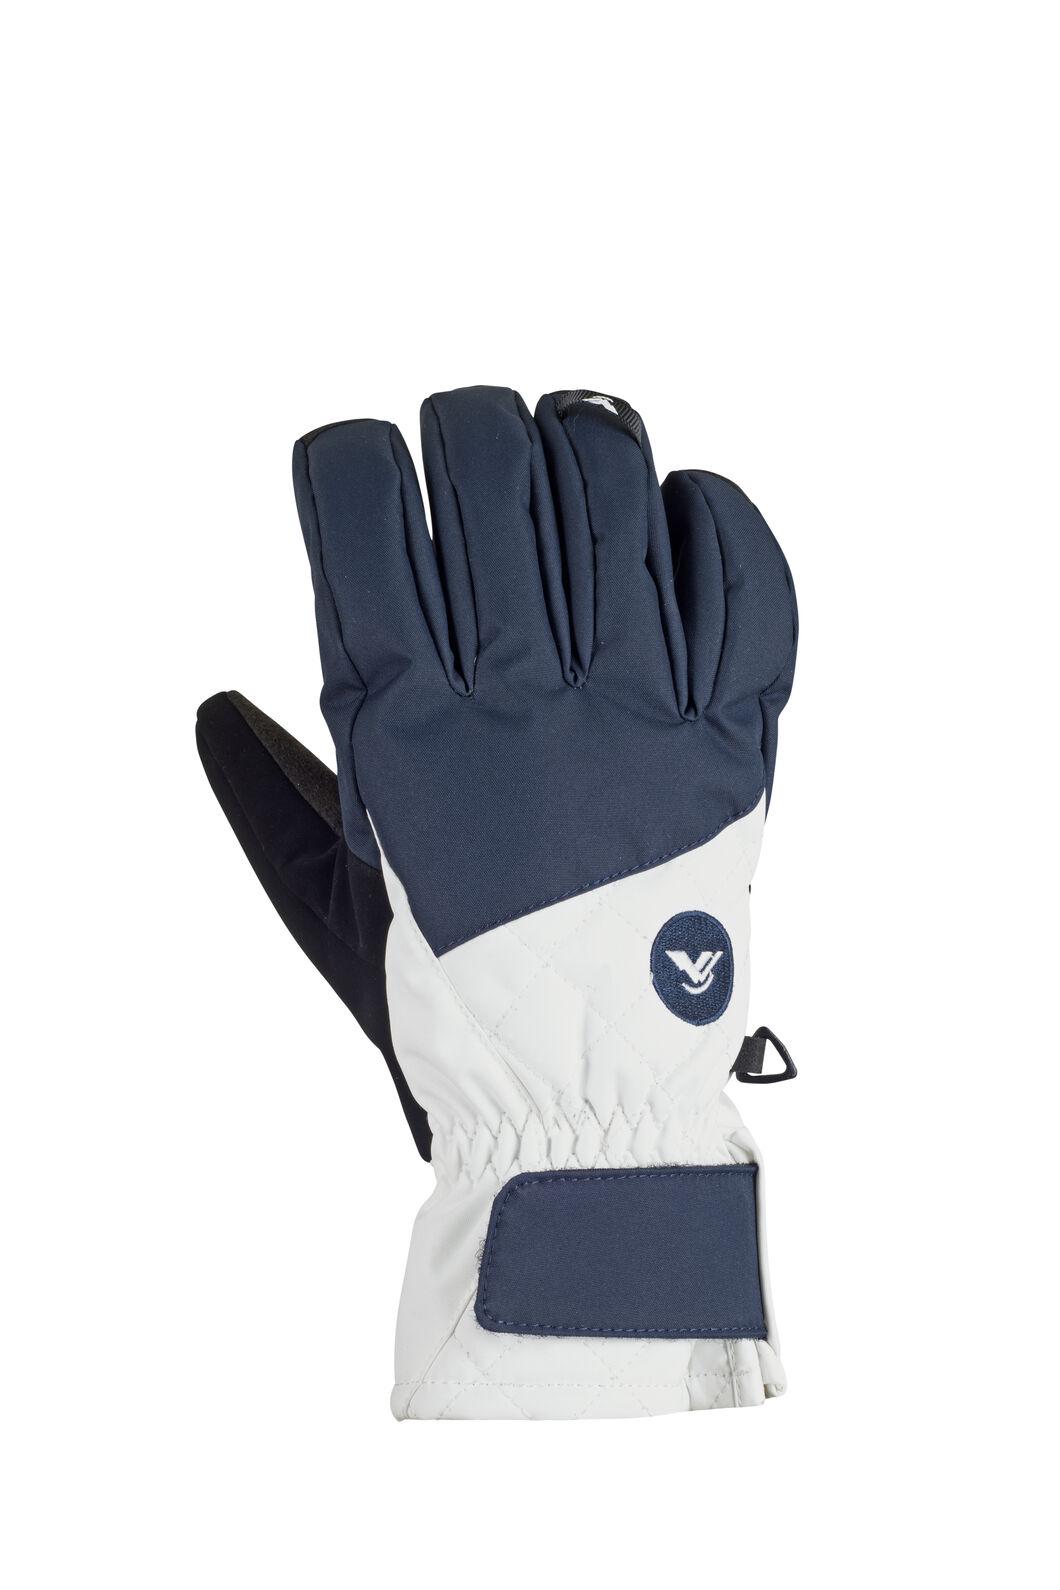 Macpac Piste Glove, Salute, hi-res